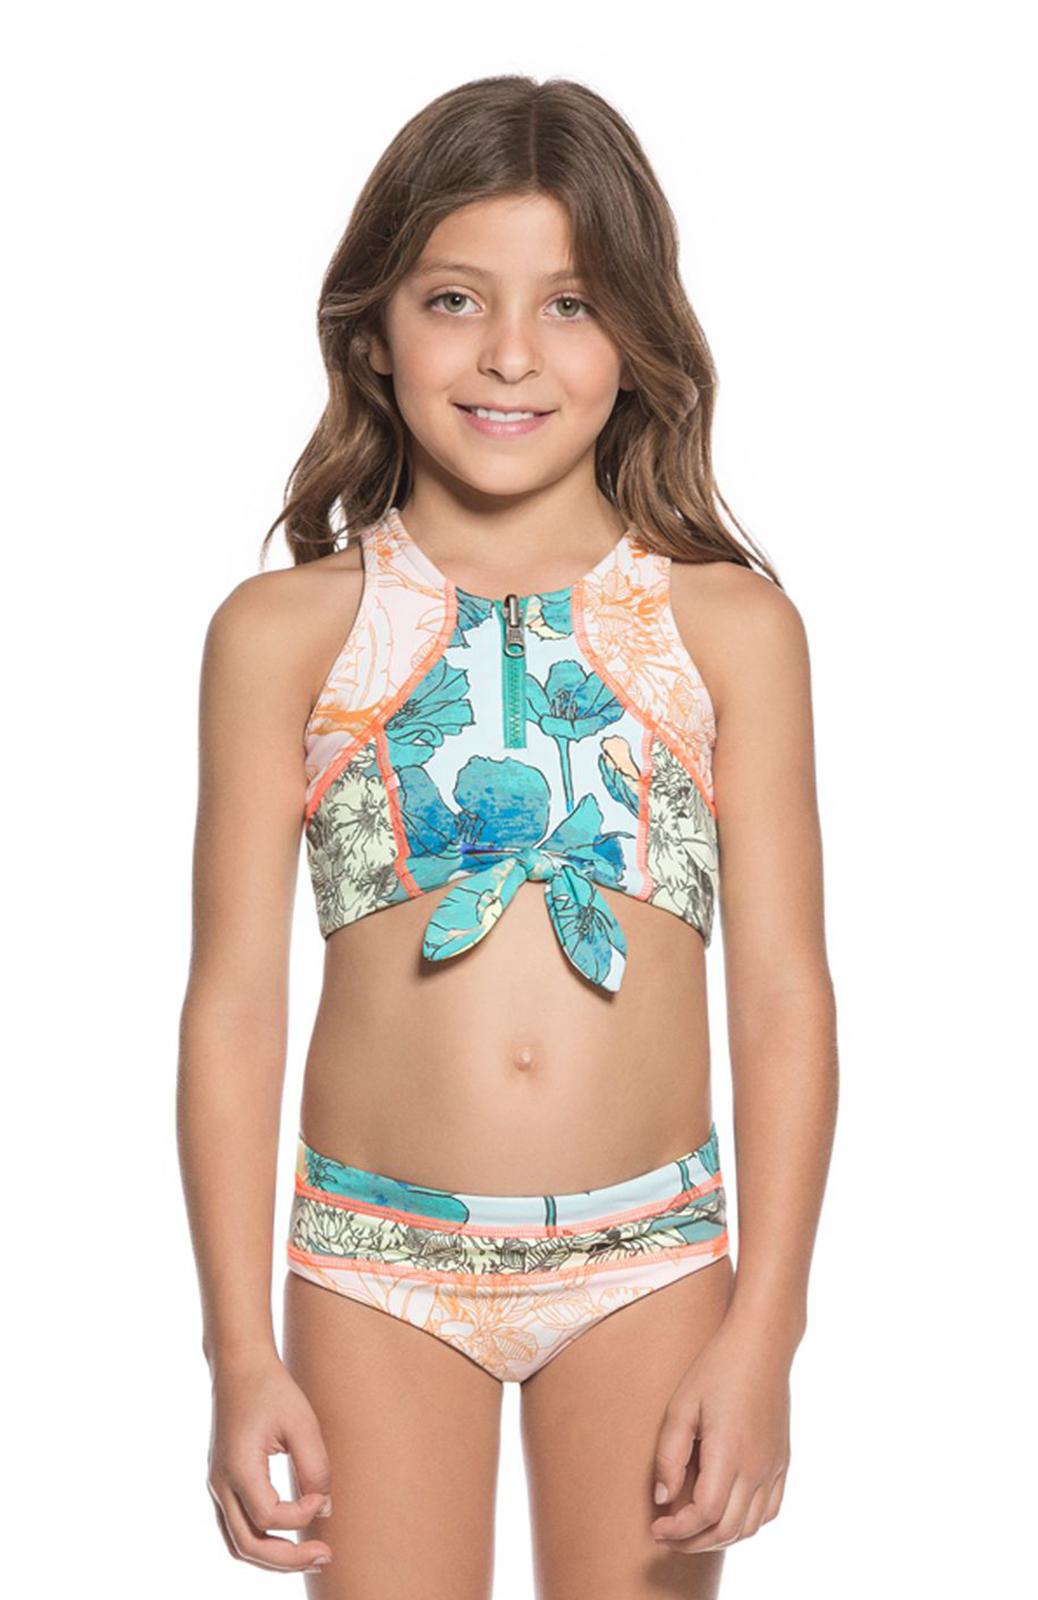 6a15c2f9351 Little Girls Mixed Print Bikini Set With Bow-tie Crop Top - Its Knot Me -  Maaji